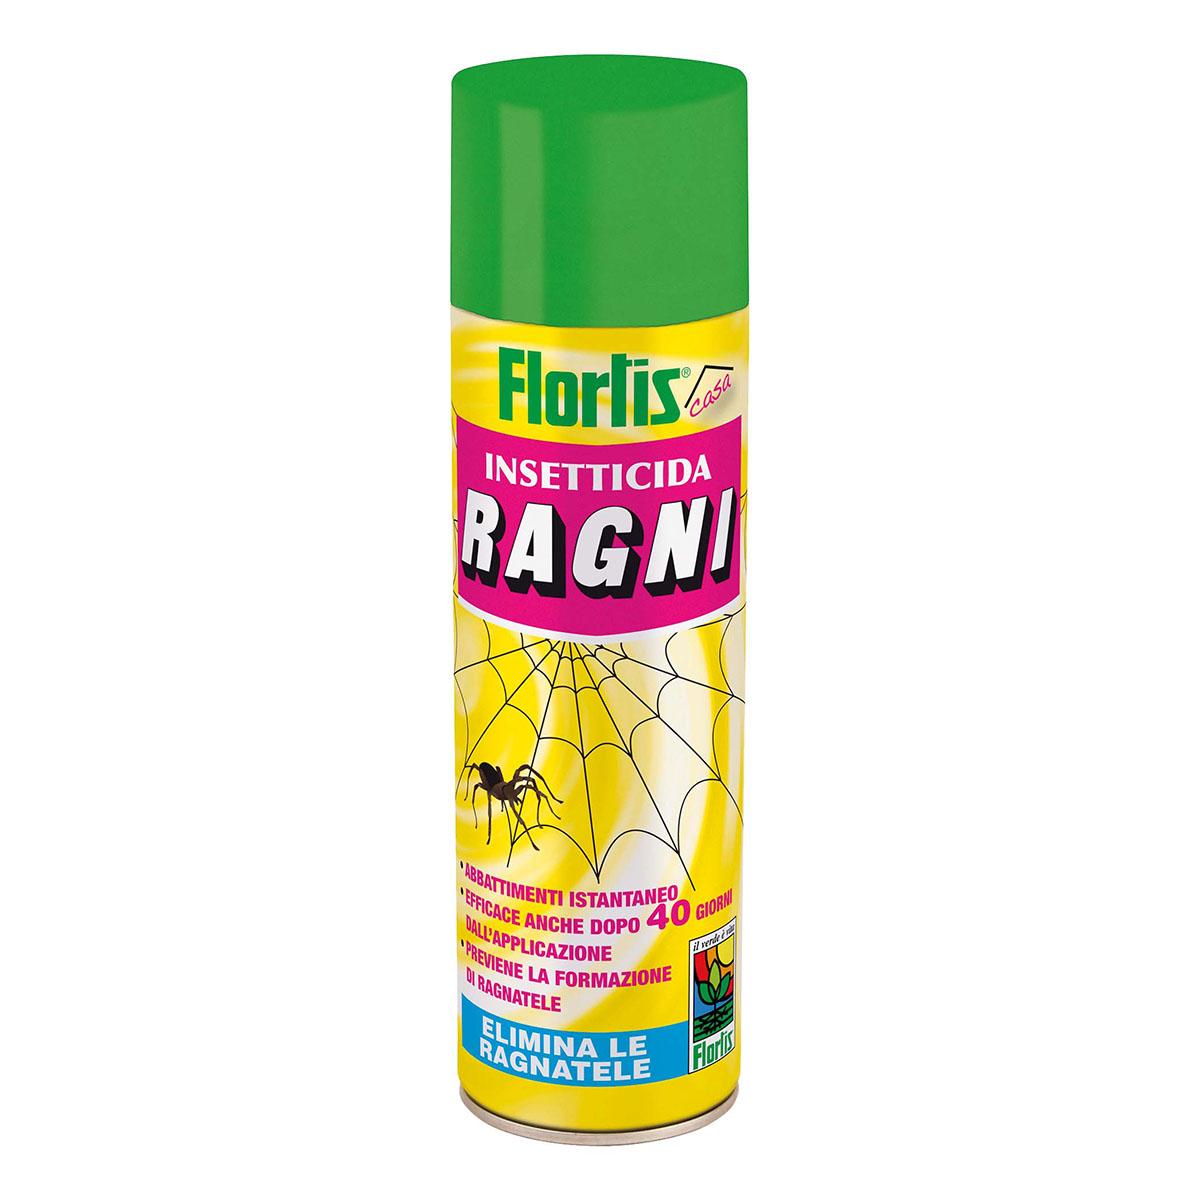 Flortis Insetticida Ragni Spray